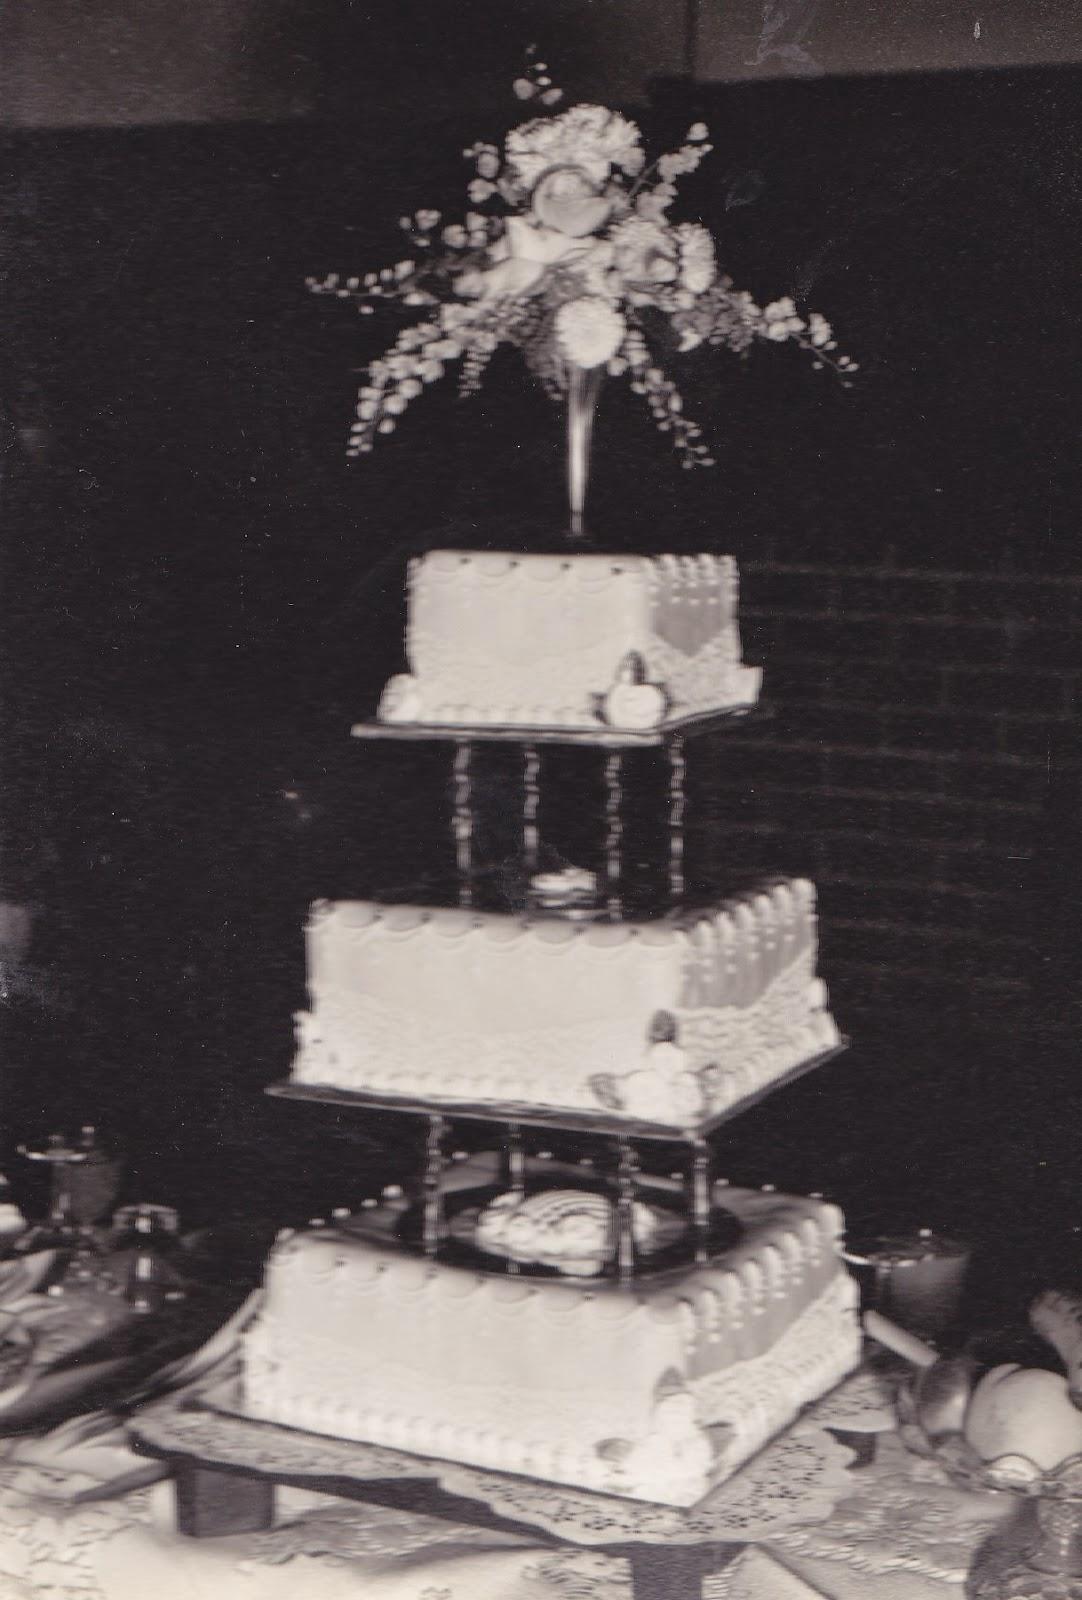 My Wedding Cake 1967